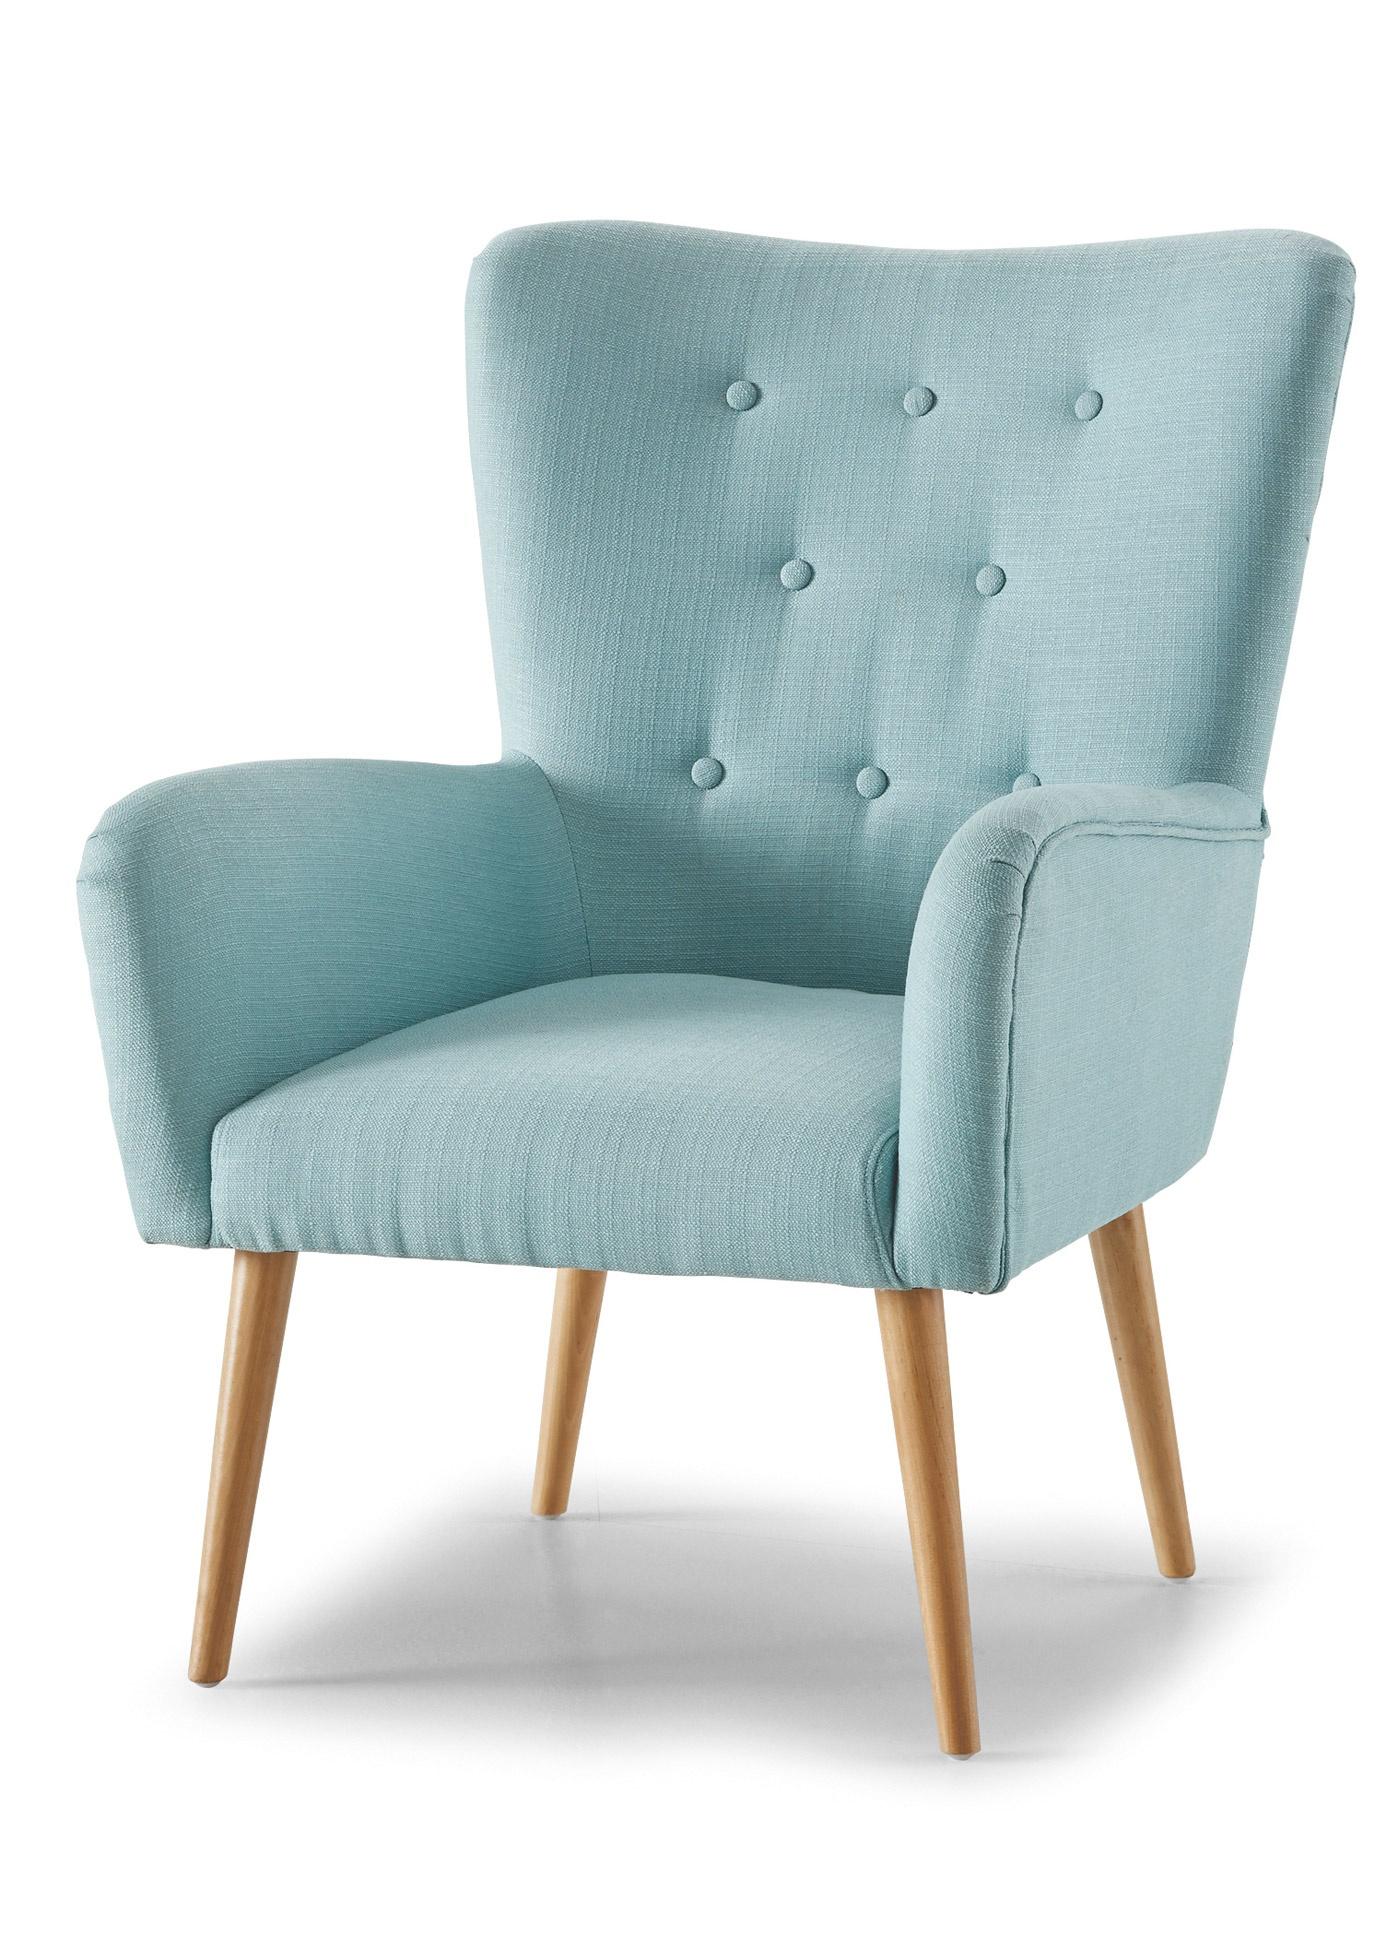 Alle bedrijven online fauteuil pagina 3 - Comfortabele fauteuil ...